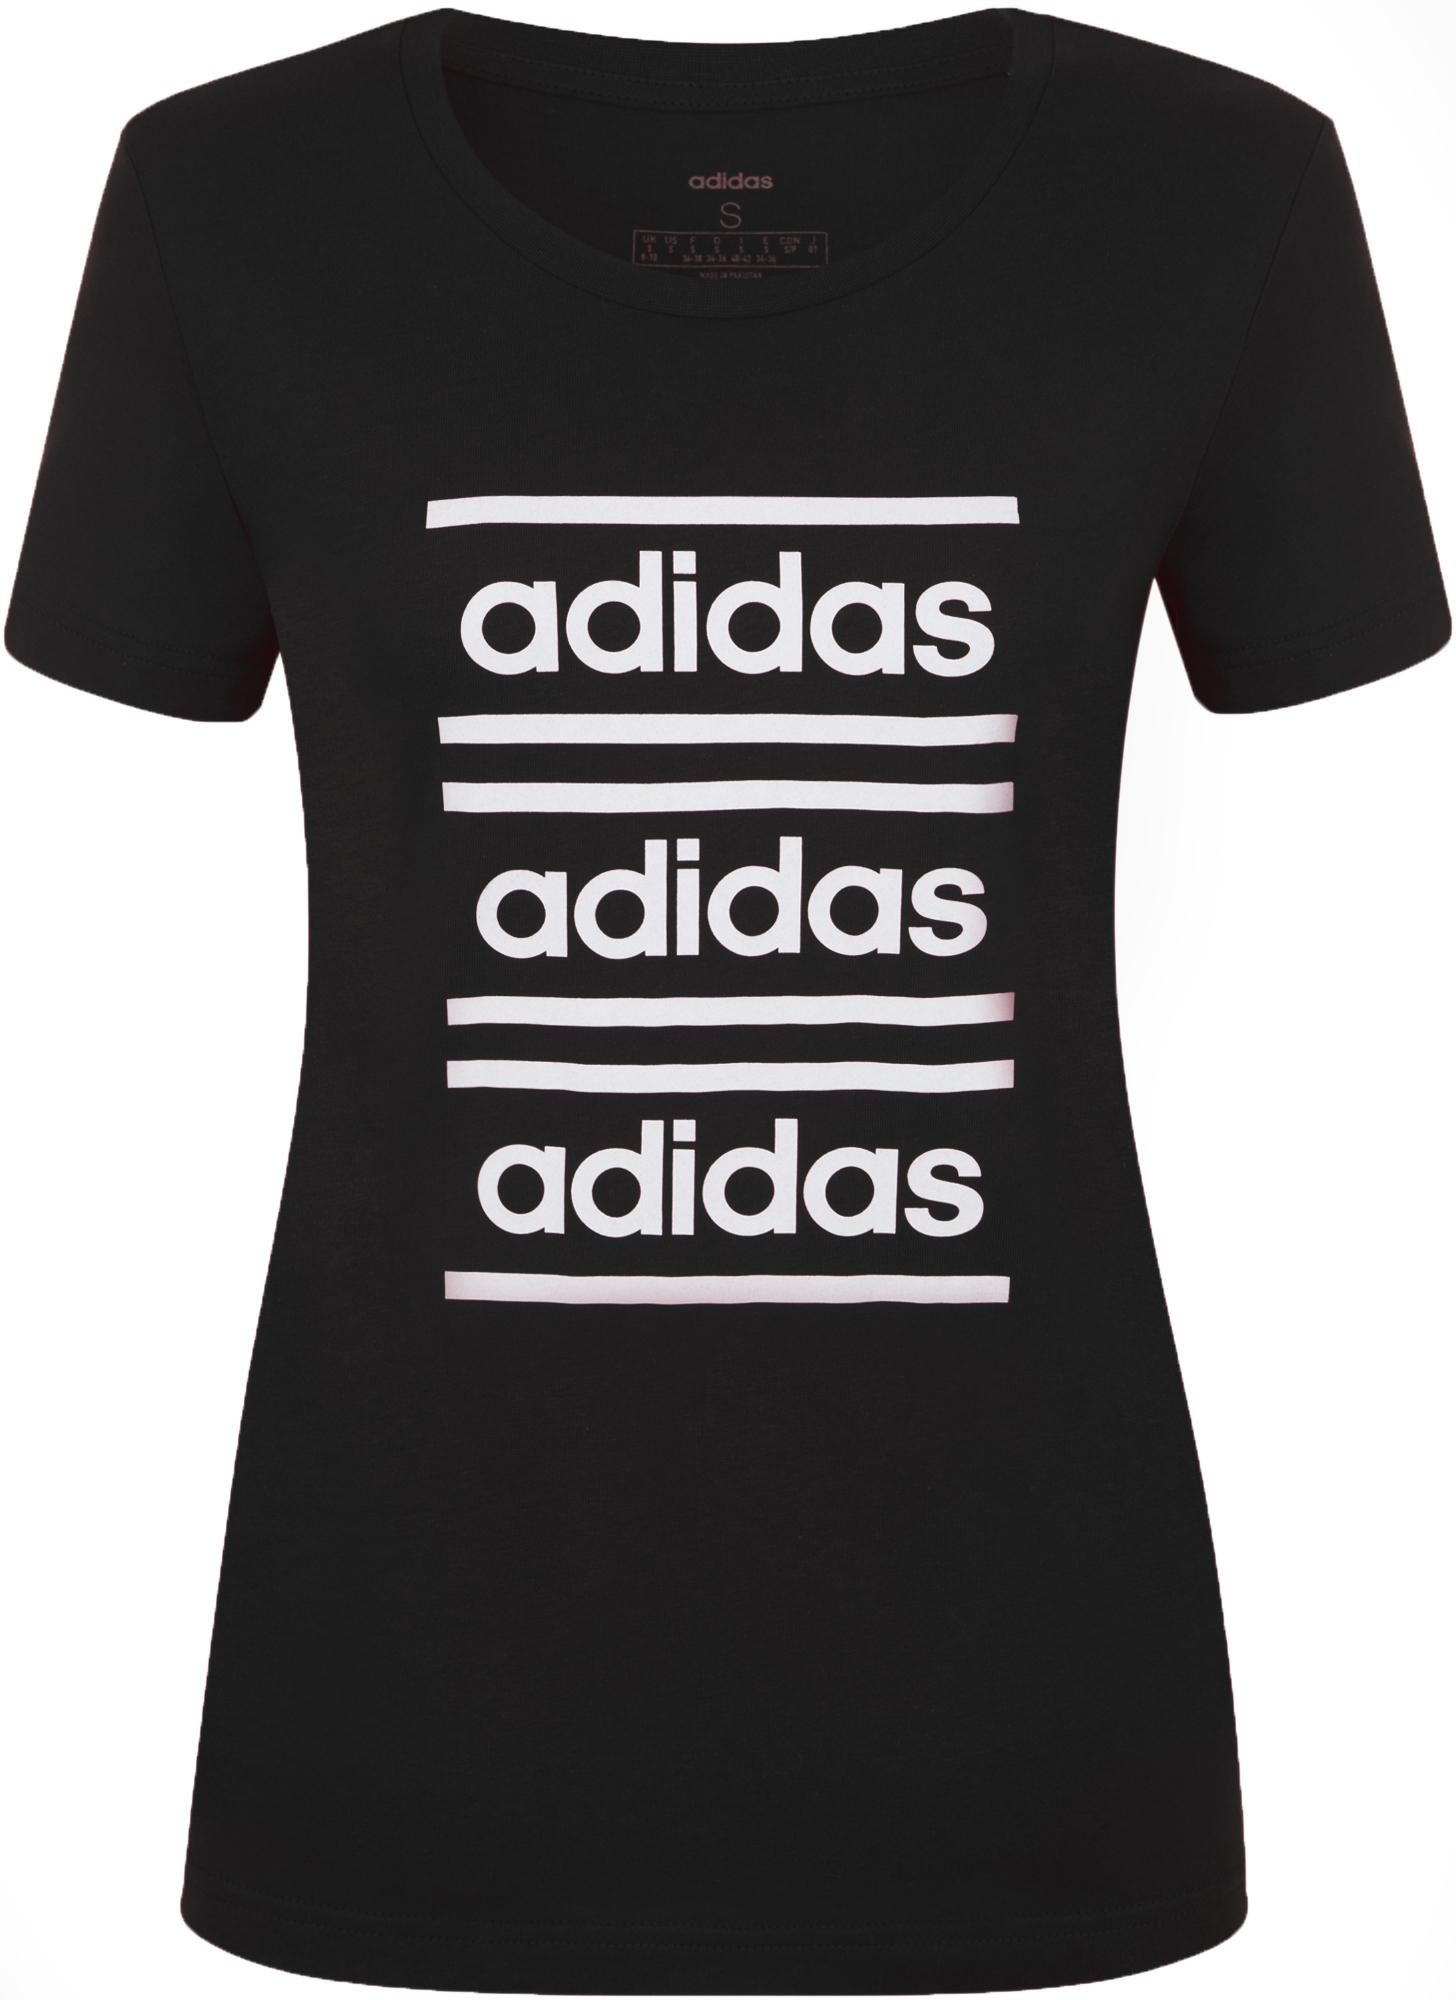 Adidas Футболка женская Celebrate the 90s, размер 54-56